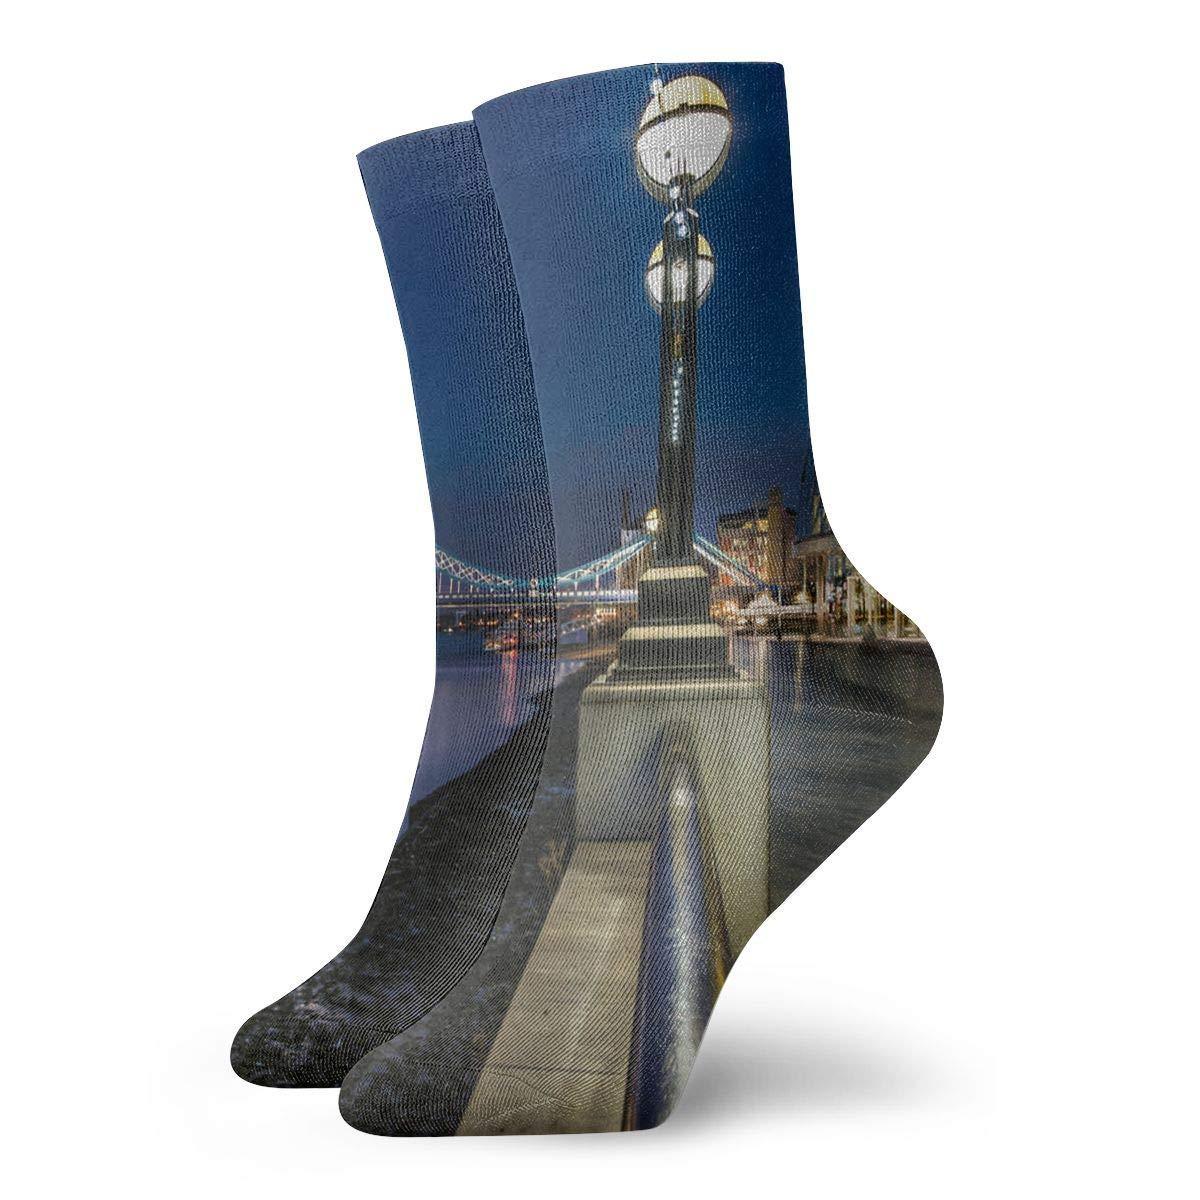 WEEDKEYCAT Tower Bridge City Adult Short Socks Cotton Cozy Socks for Mens Womens Yoga Hiking Cycling Running Soccer Sports